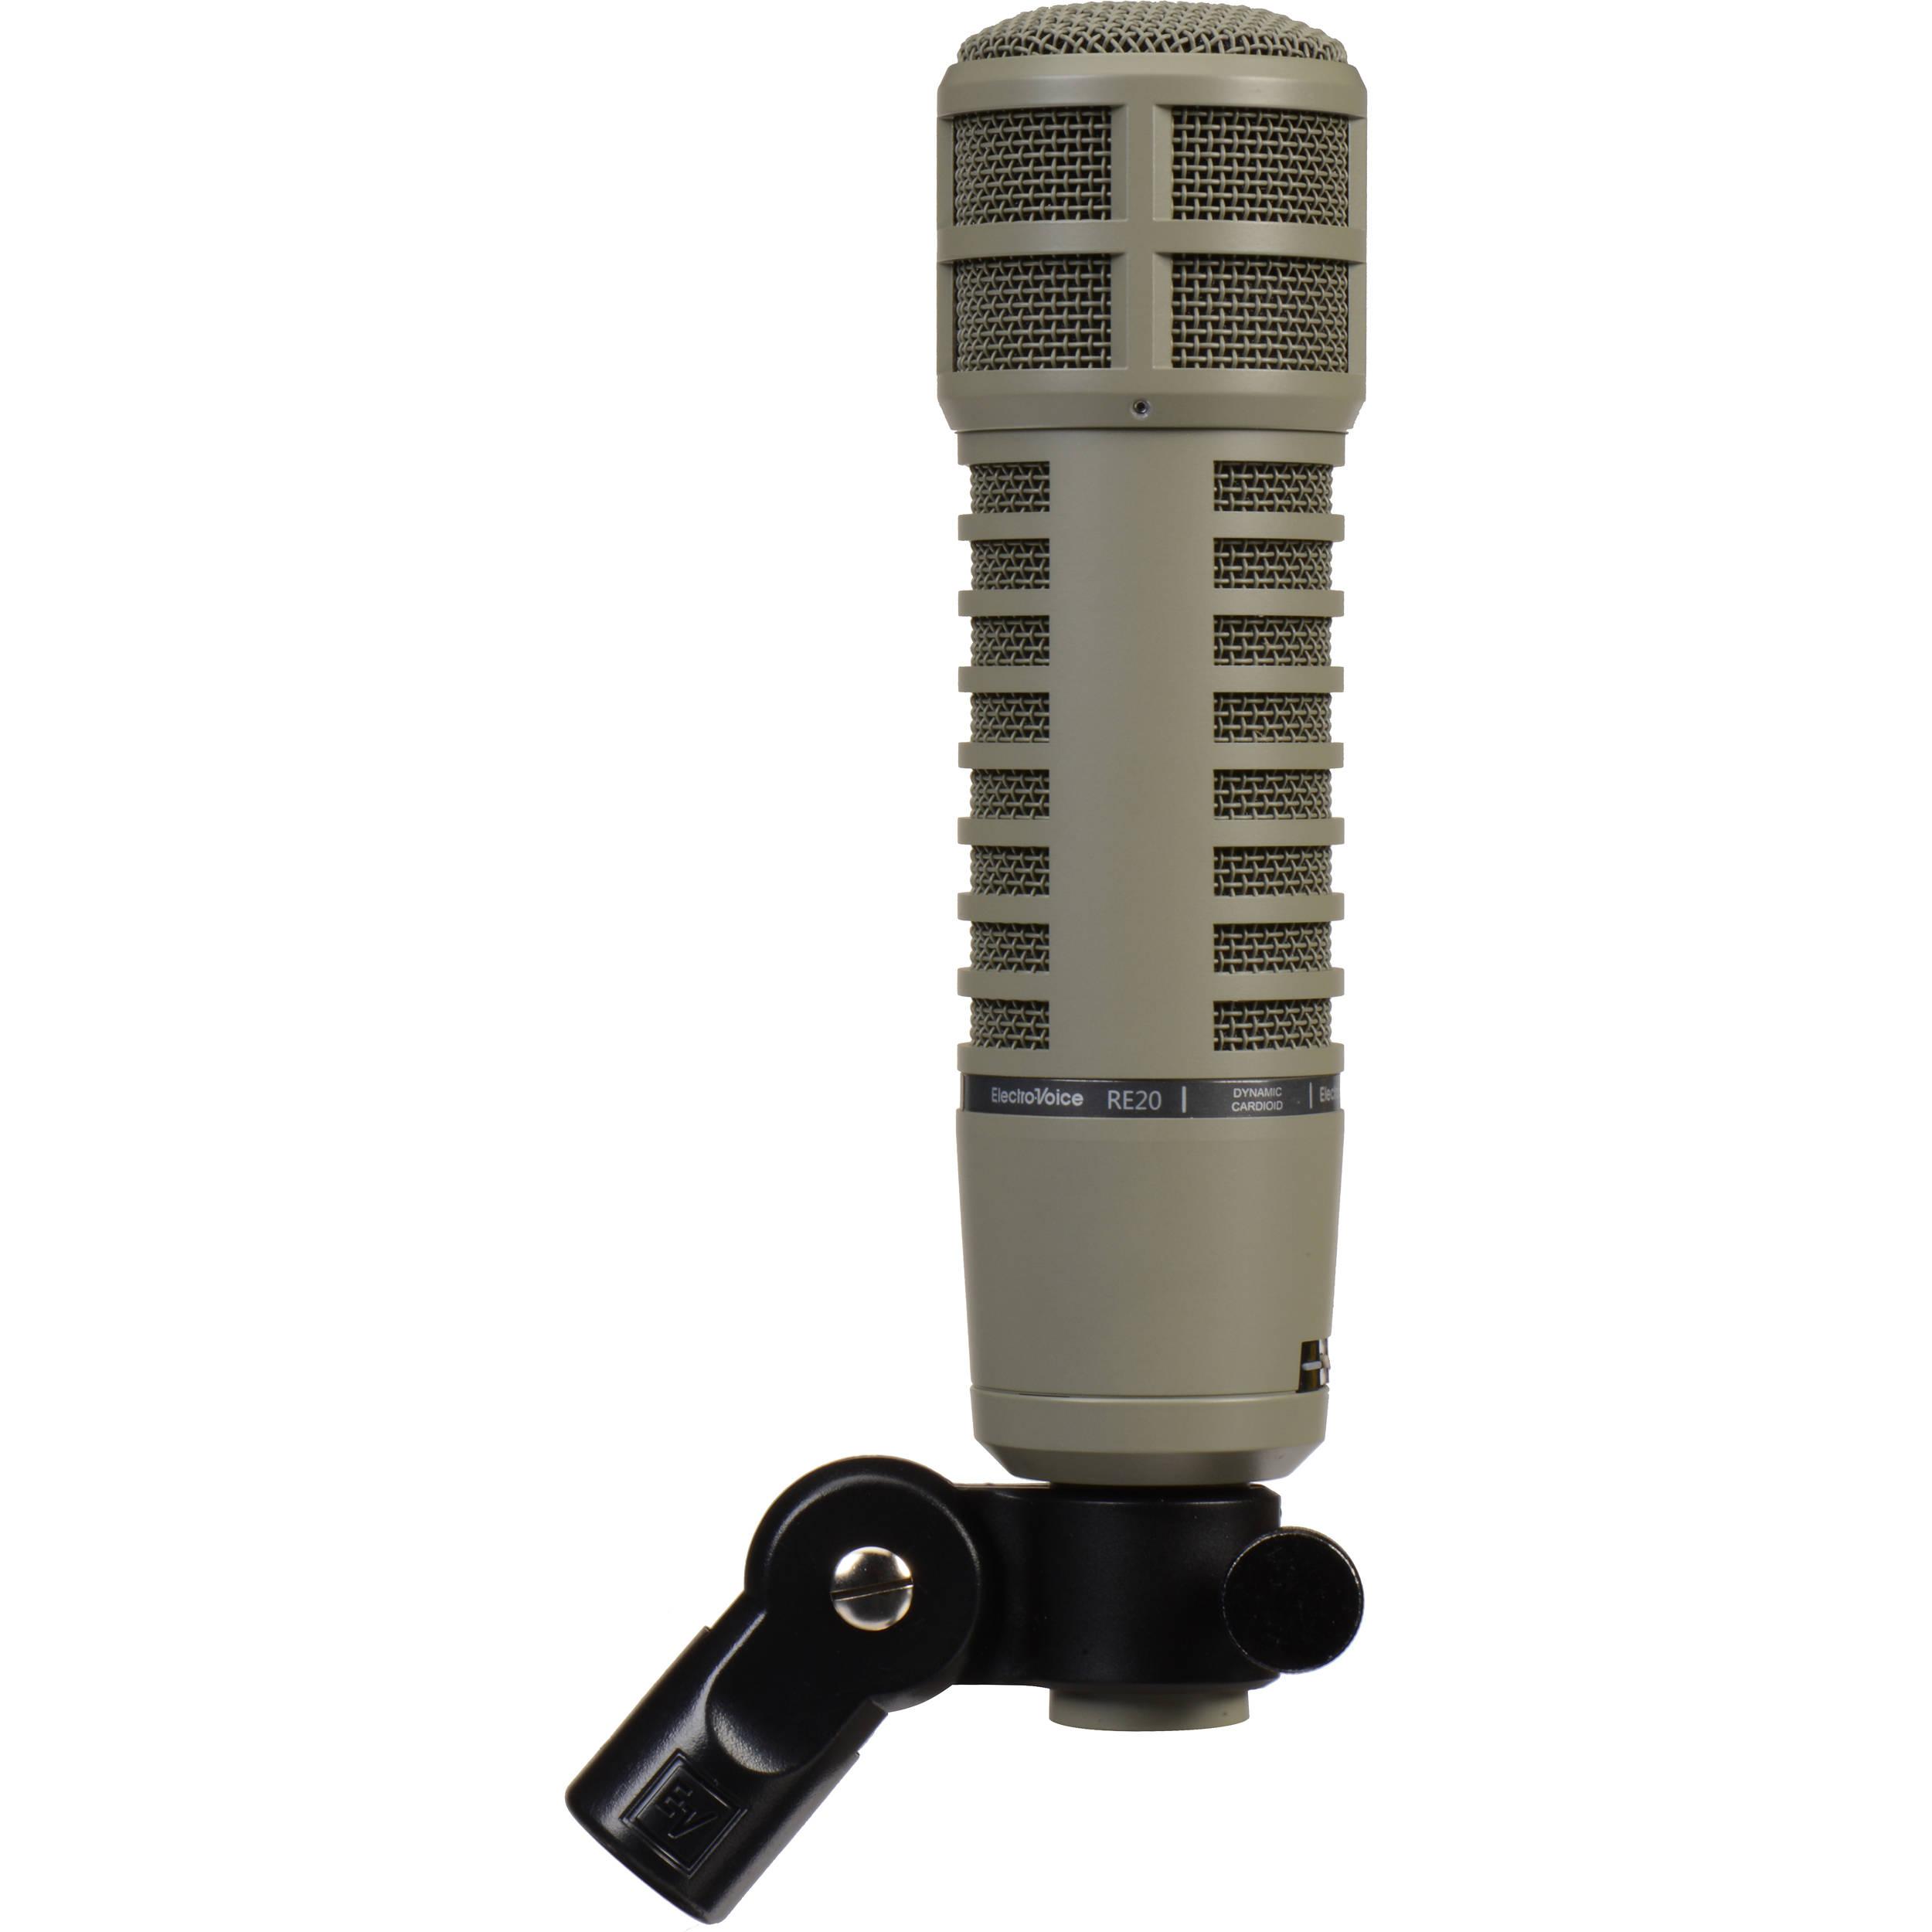 Electro_Voice_16207816_RE20_Cardoid_Voiceover_76681.jpg